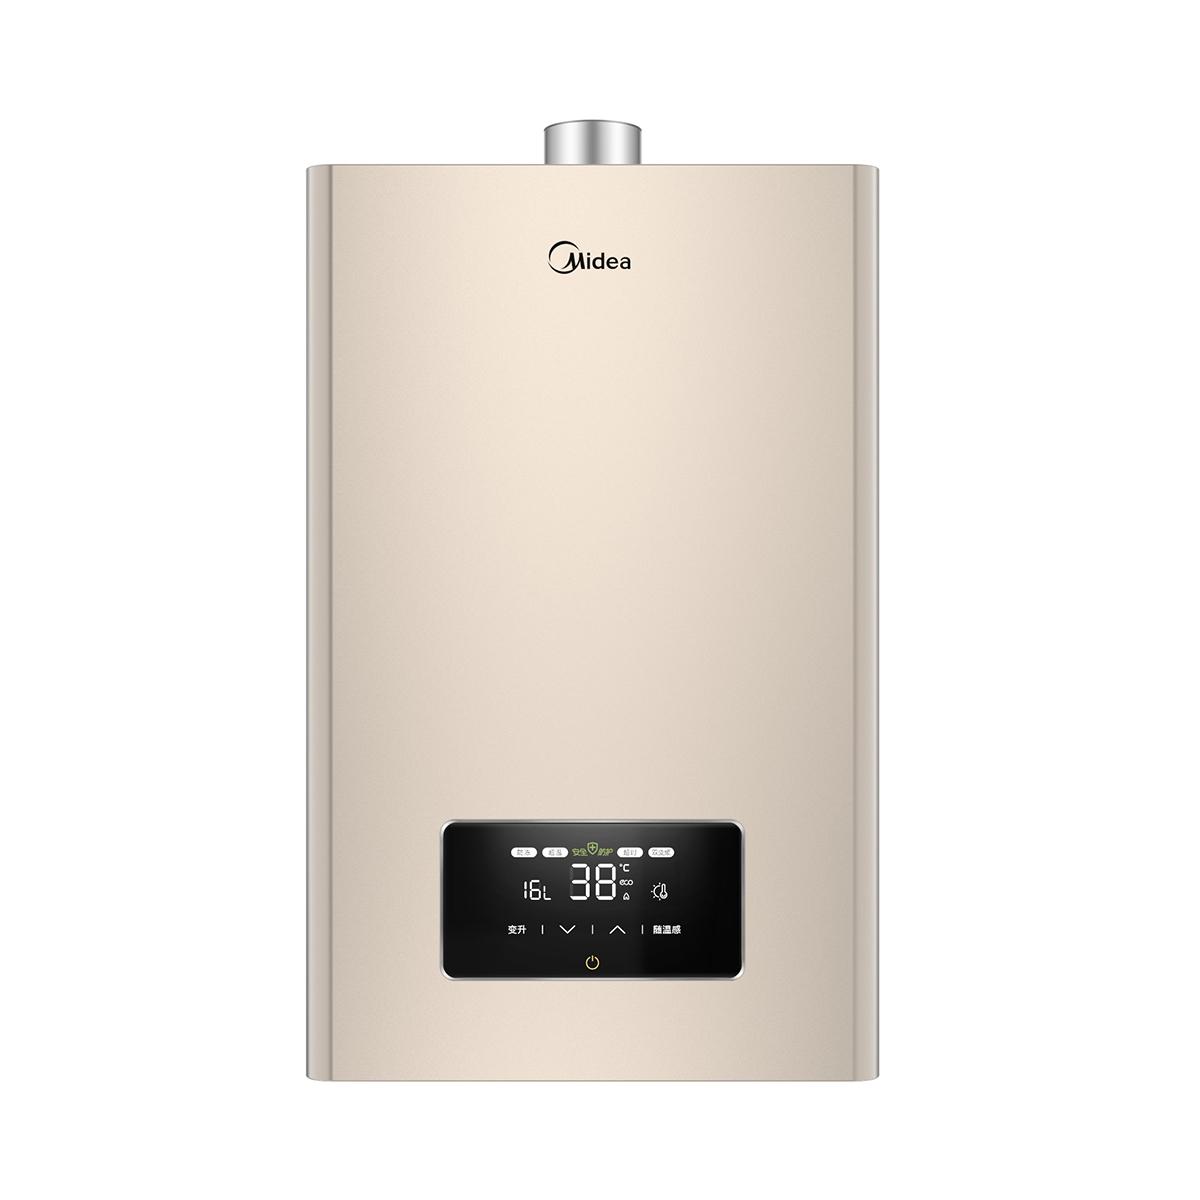 Midea/美的 JSQ22-12HC8 燃气热水器 说明书.pdf